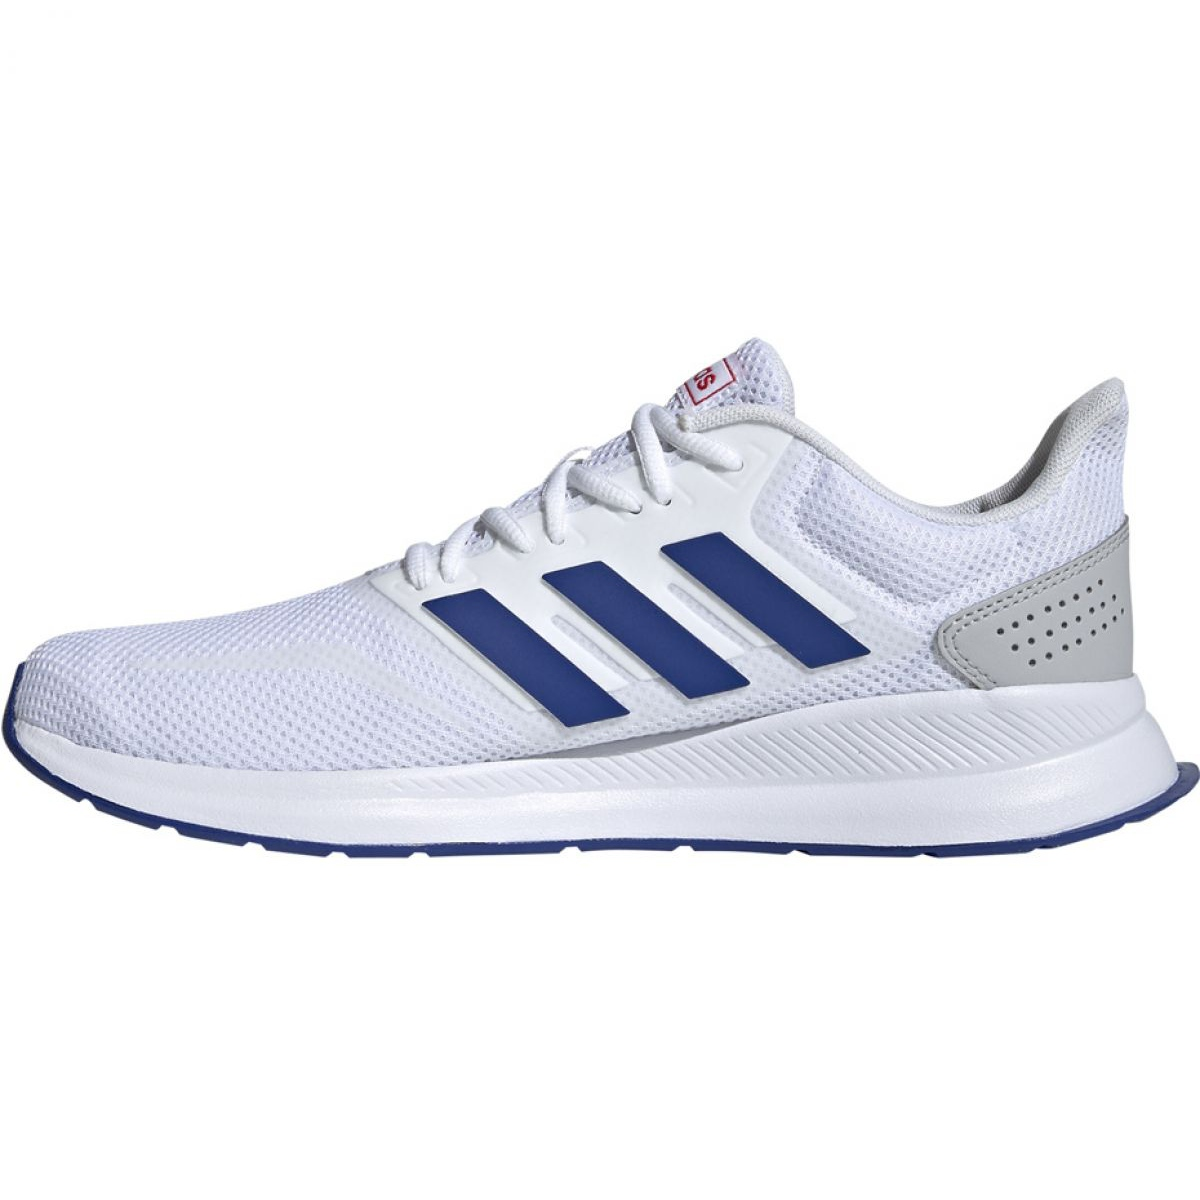 Running shoes adidas Runfalcon M EF0148 white blue